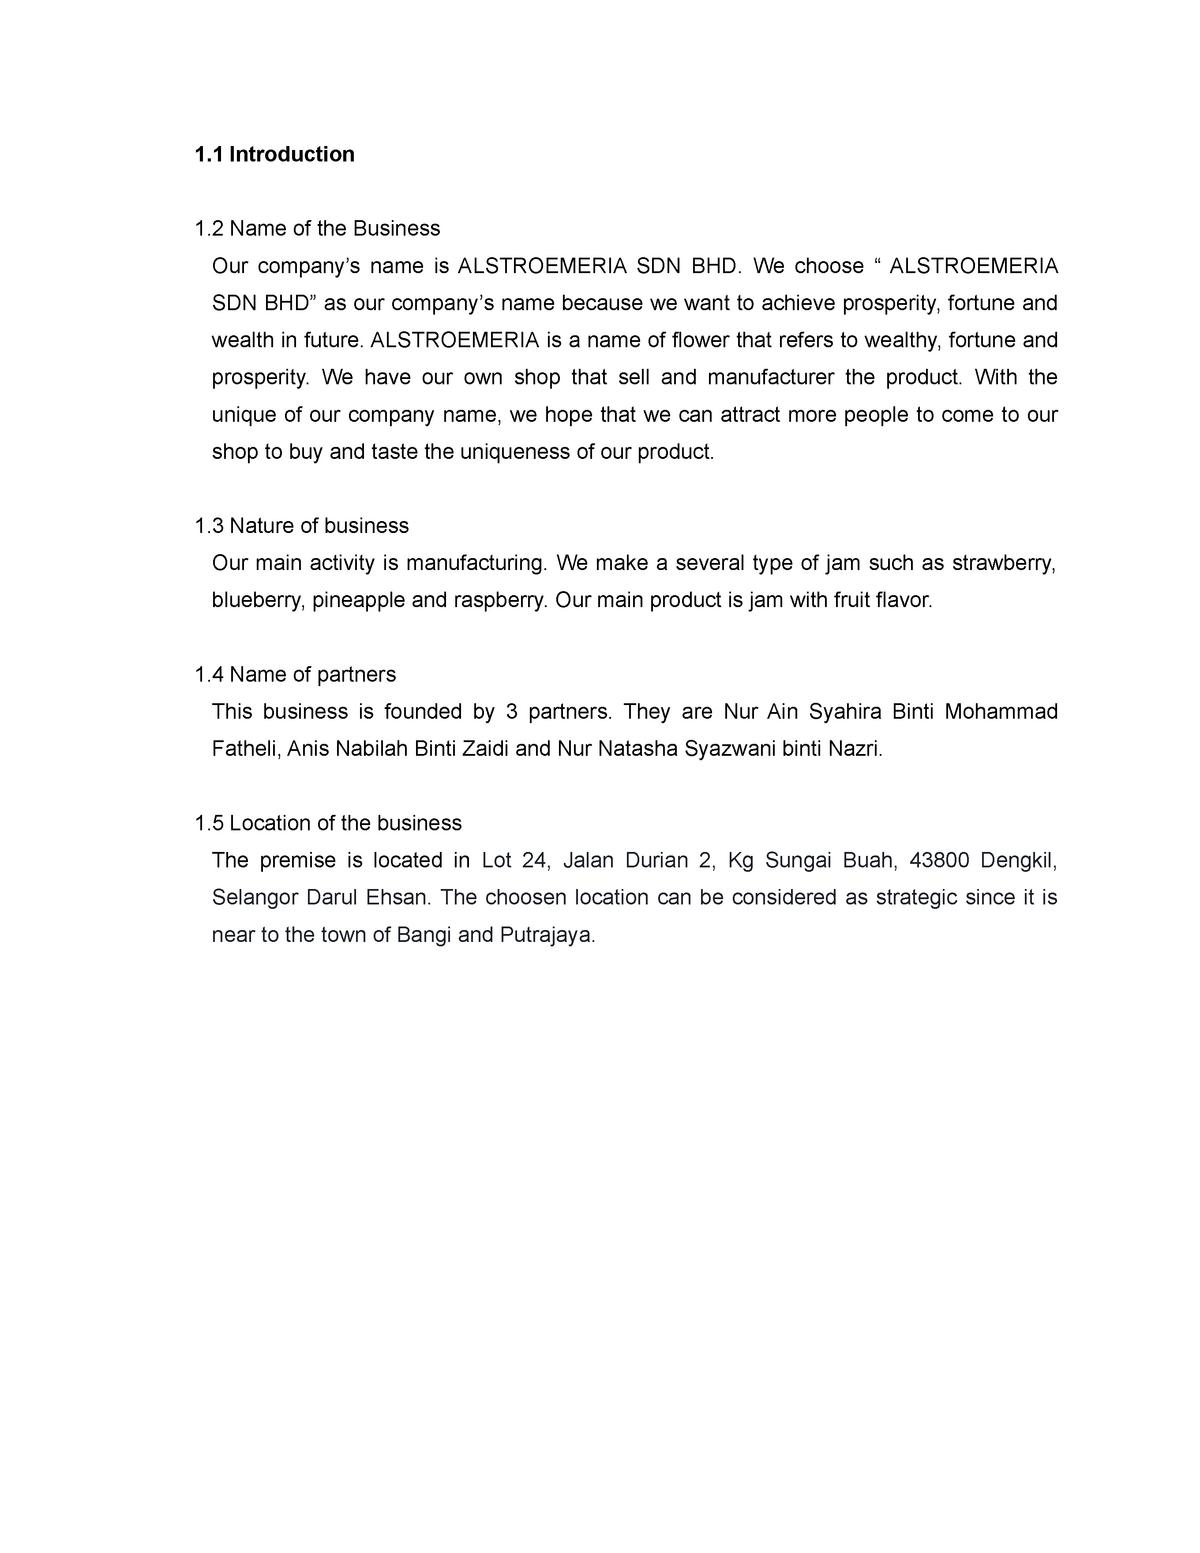 ENT300 - Business PLAN - GROUP ASSIGNMENT - StuDocu